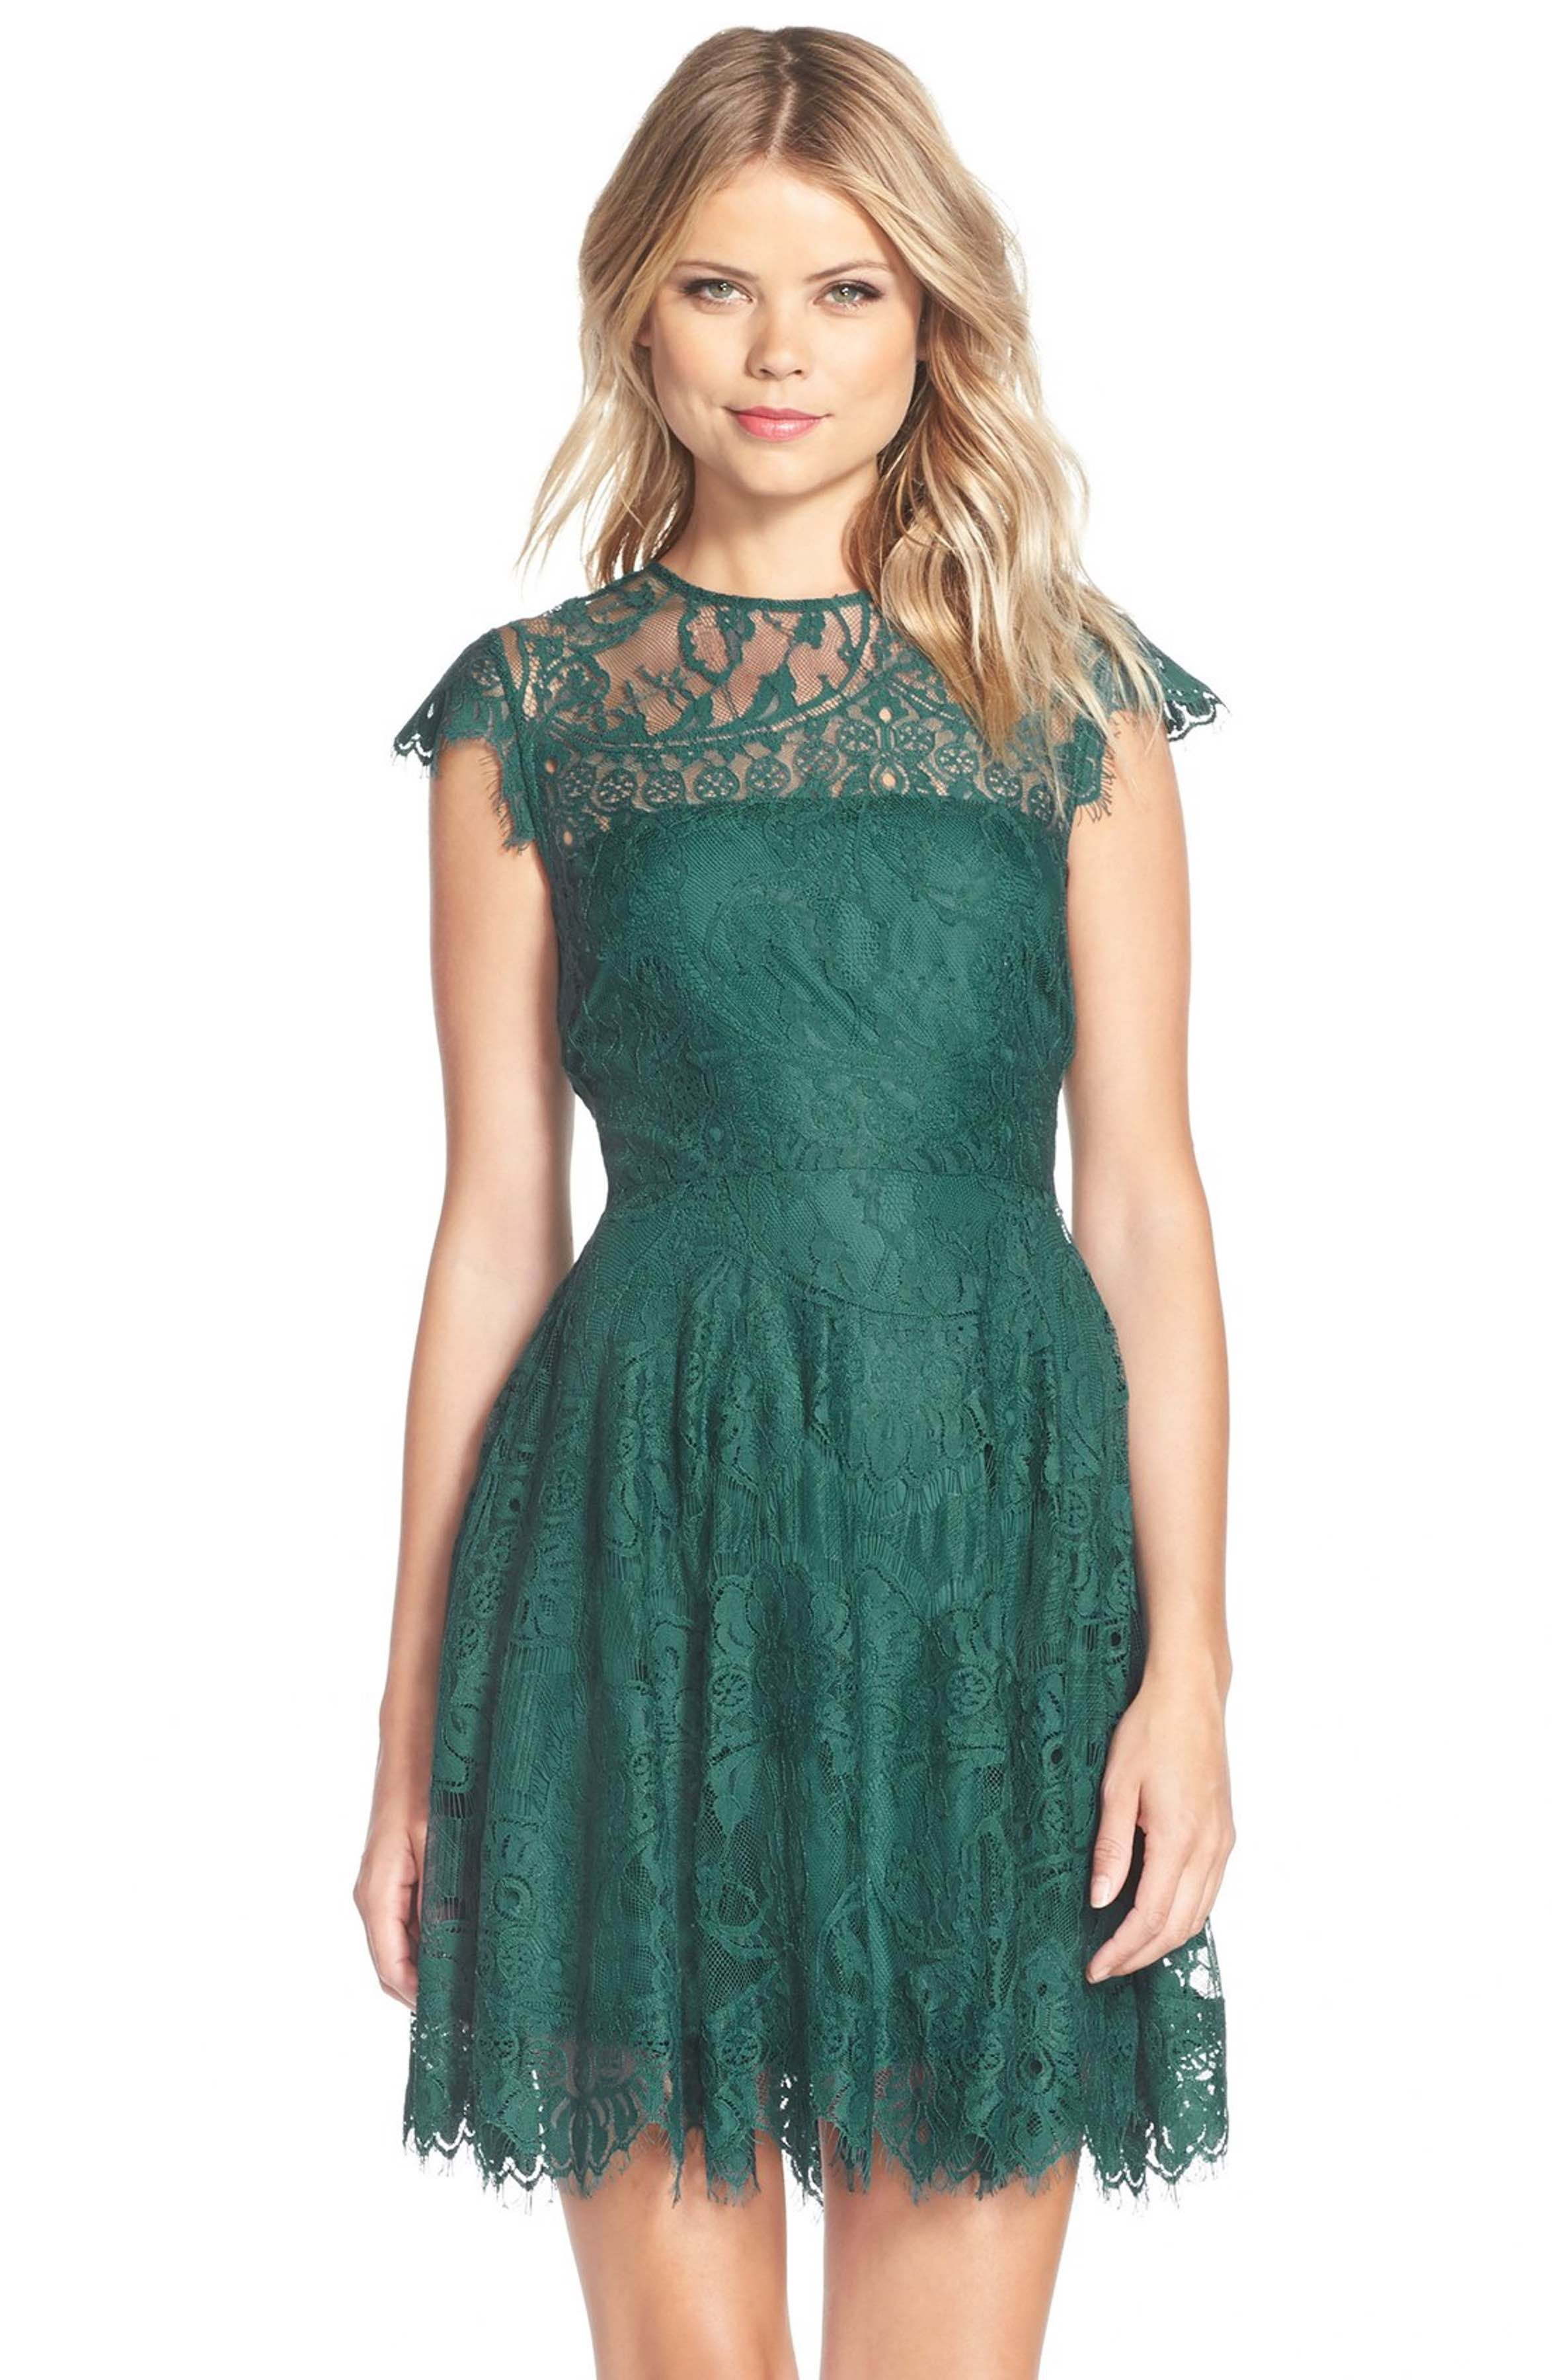 Bb Dakota Rhianna Open Back Lace Fit Flare Cocktail Dress Nordstrom Exclusive Nordstrom Cocktail Dress Lace Fit And Flare Cocktail Dress Green Lace Dresses [ 3600 x 2348 Pixel ]